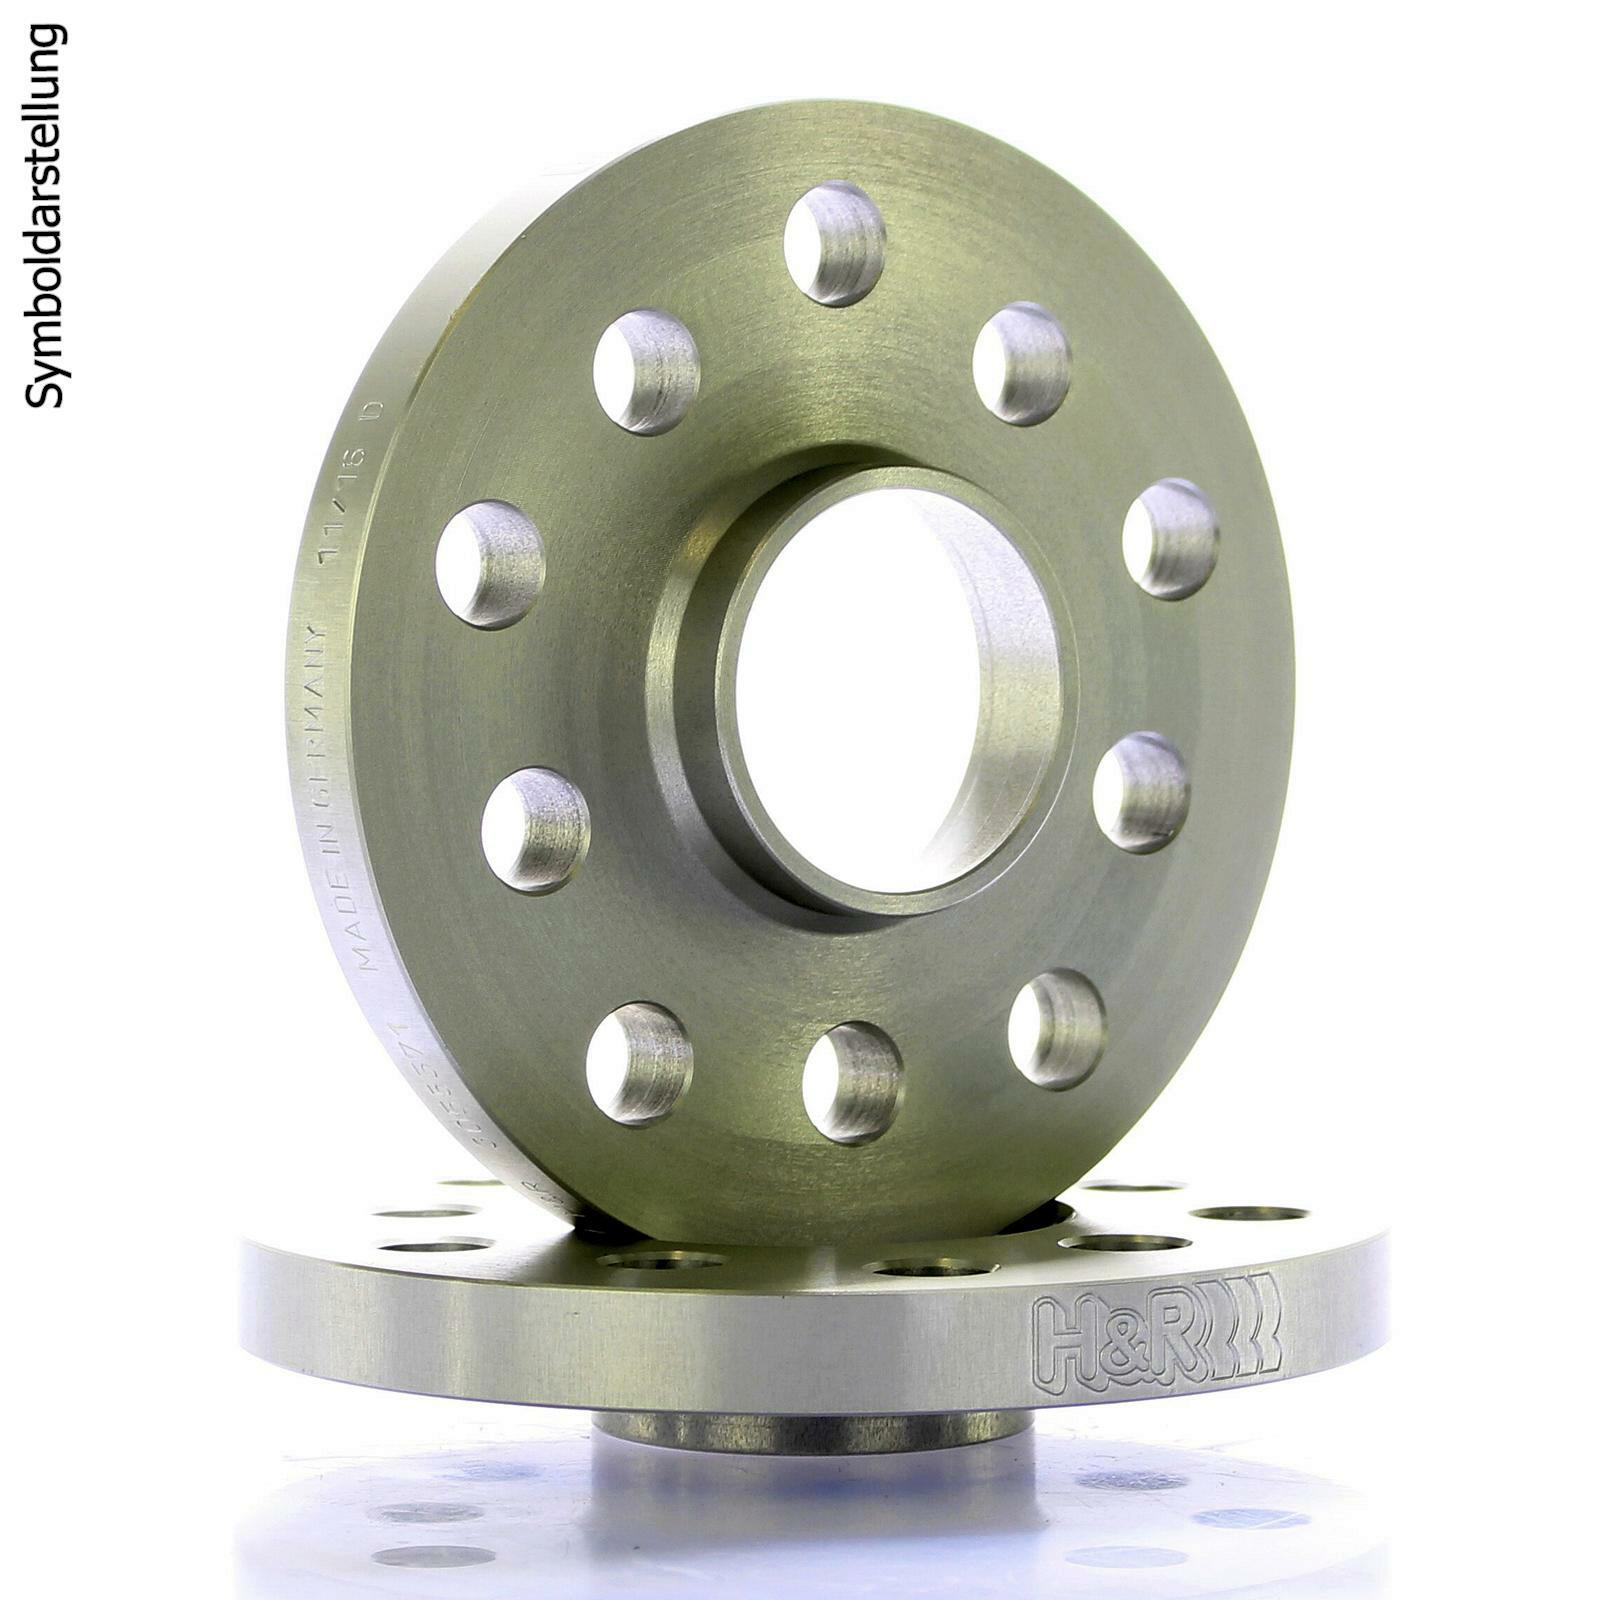 H&R DR Spurplatten Spurverbreiterung Distanzscheiben/Ring 5x120 20mm // 2x10mm